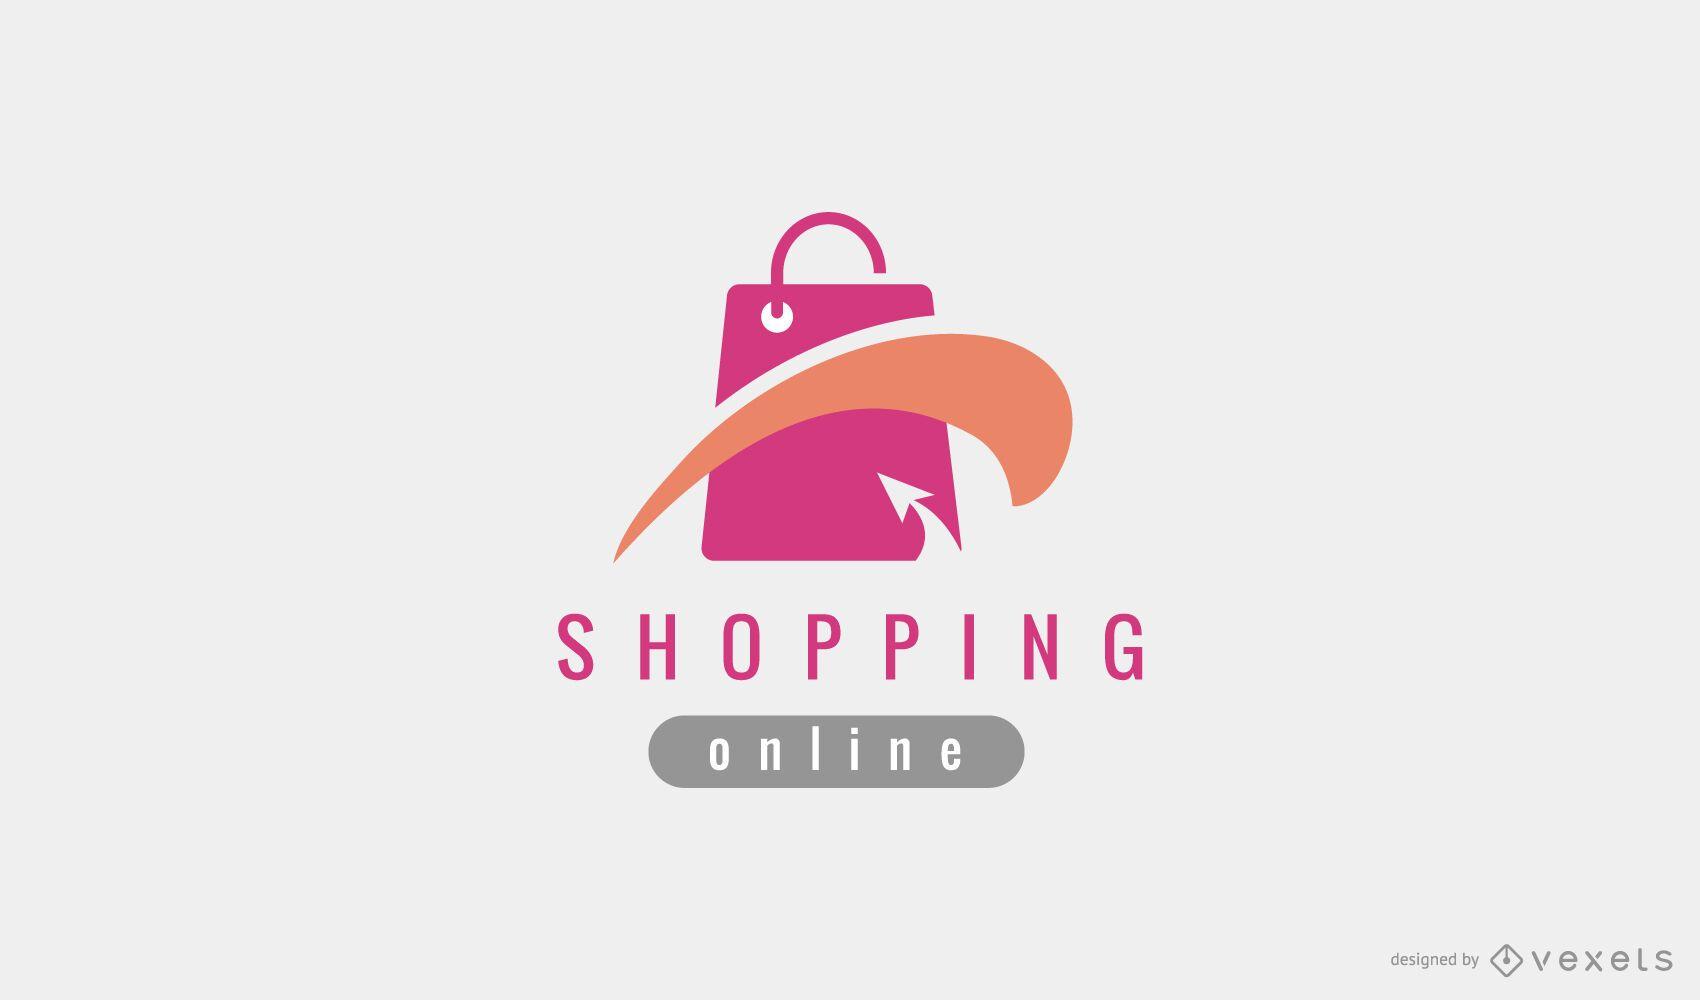 Logotipo editable de bolsa de compras en línea